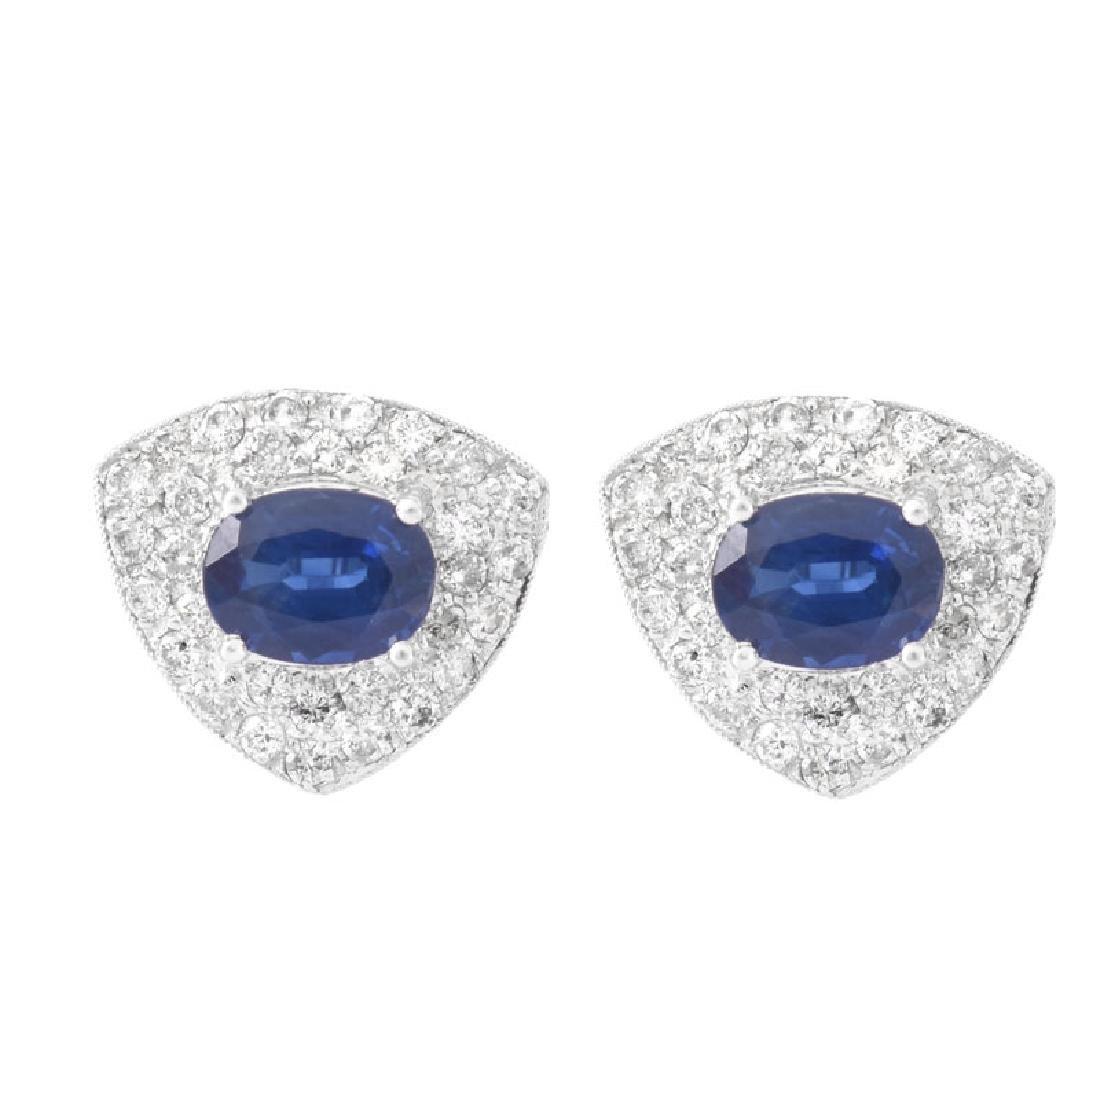 Approx. 3.25 Carat Oval Cut Sapphire, 1.15 carat Pave